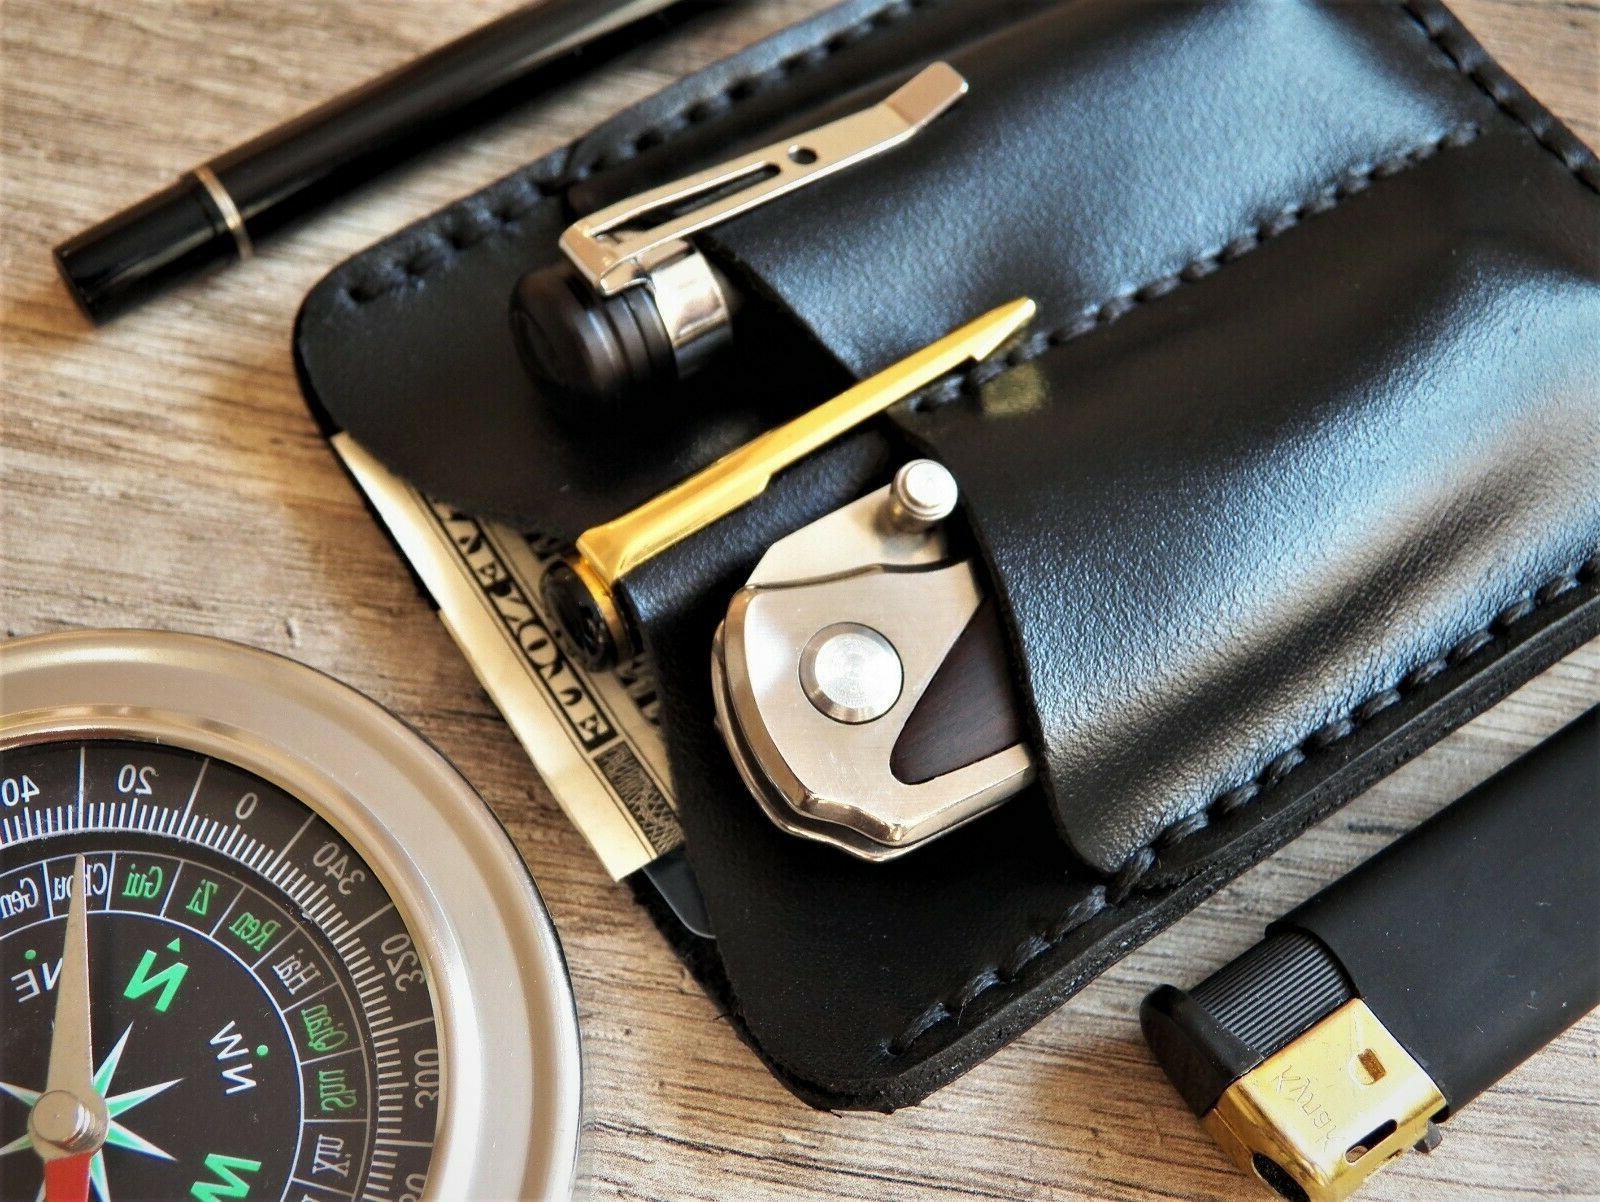 pocket organiser leather wallet Leatherman